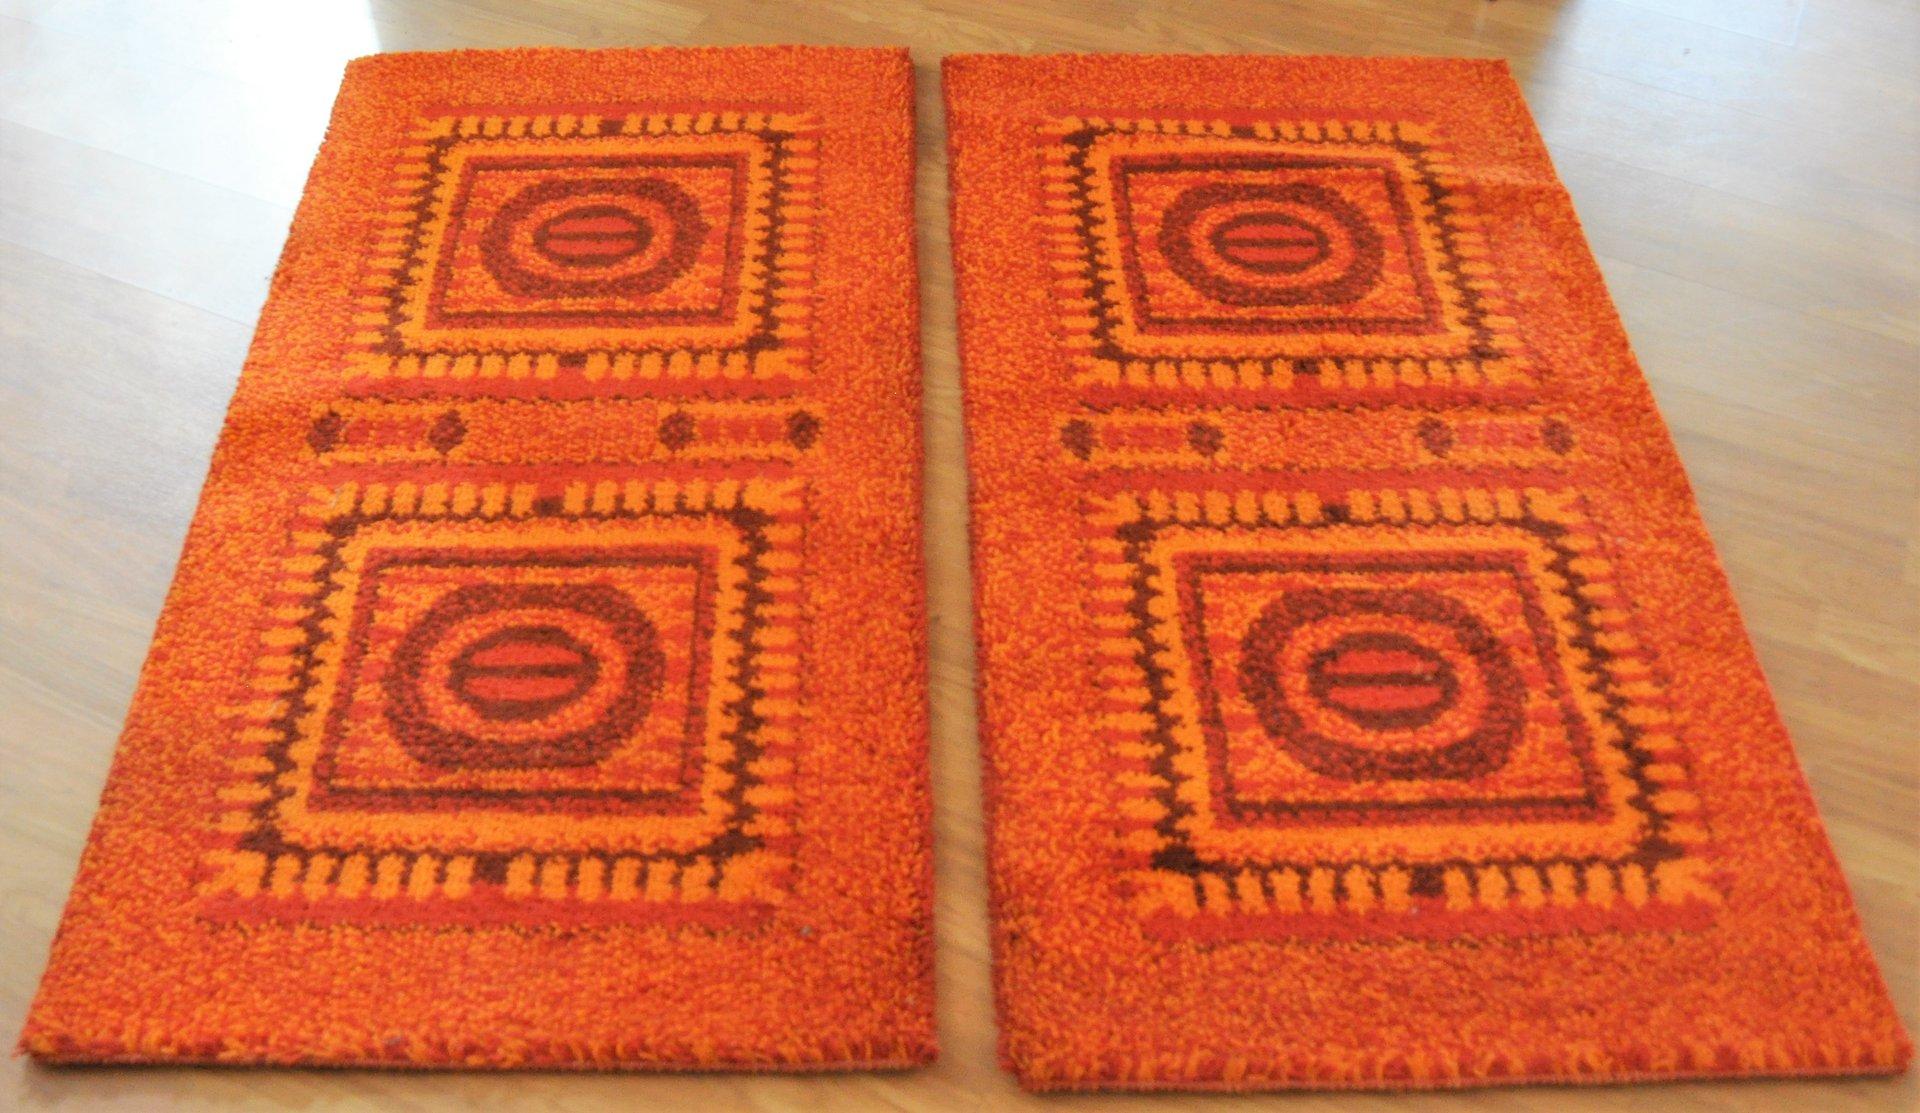 kleine orangenfarbene mosaik teppiche 1970er 2er set bei. Black Bedroom Furniture Sets. Home Design Ideas